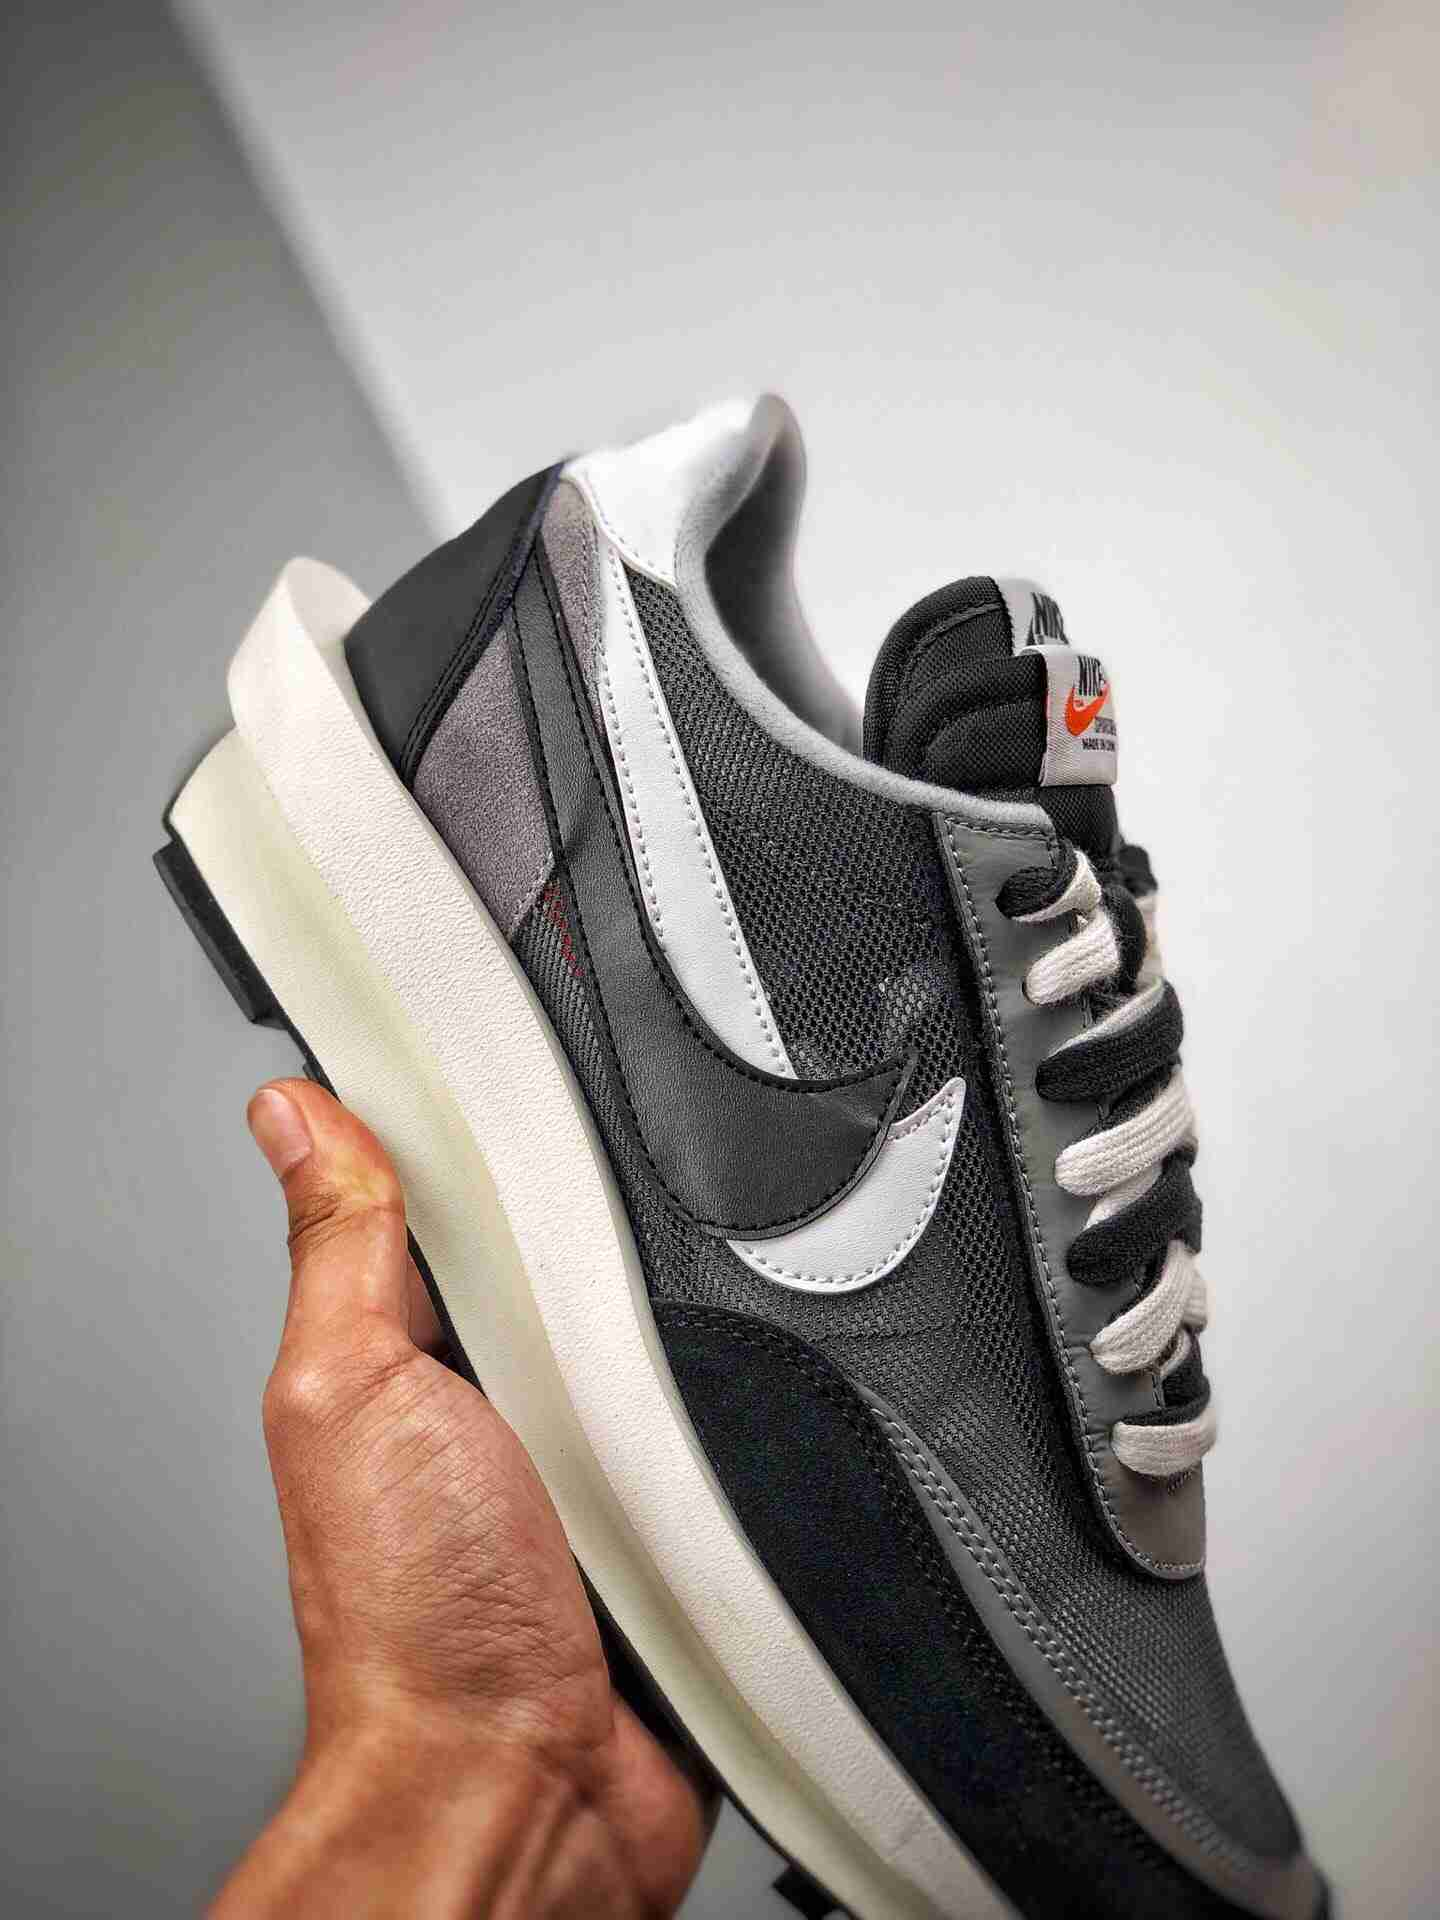 Sacai x Nike LVD Waffle Daybreak  解构高端跑鞋